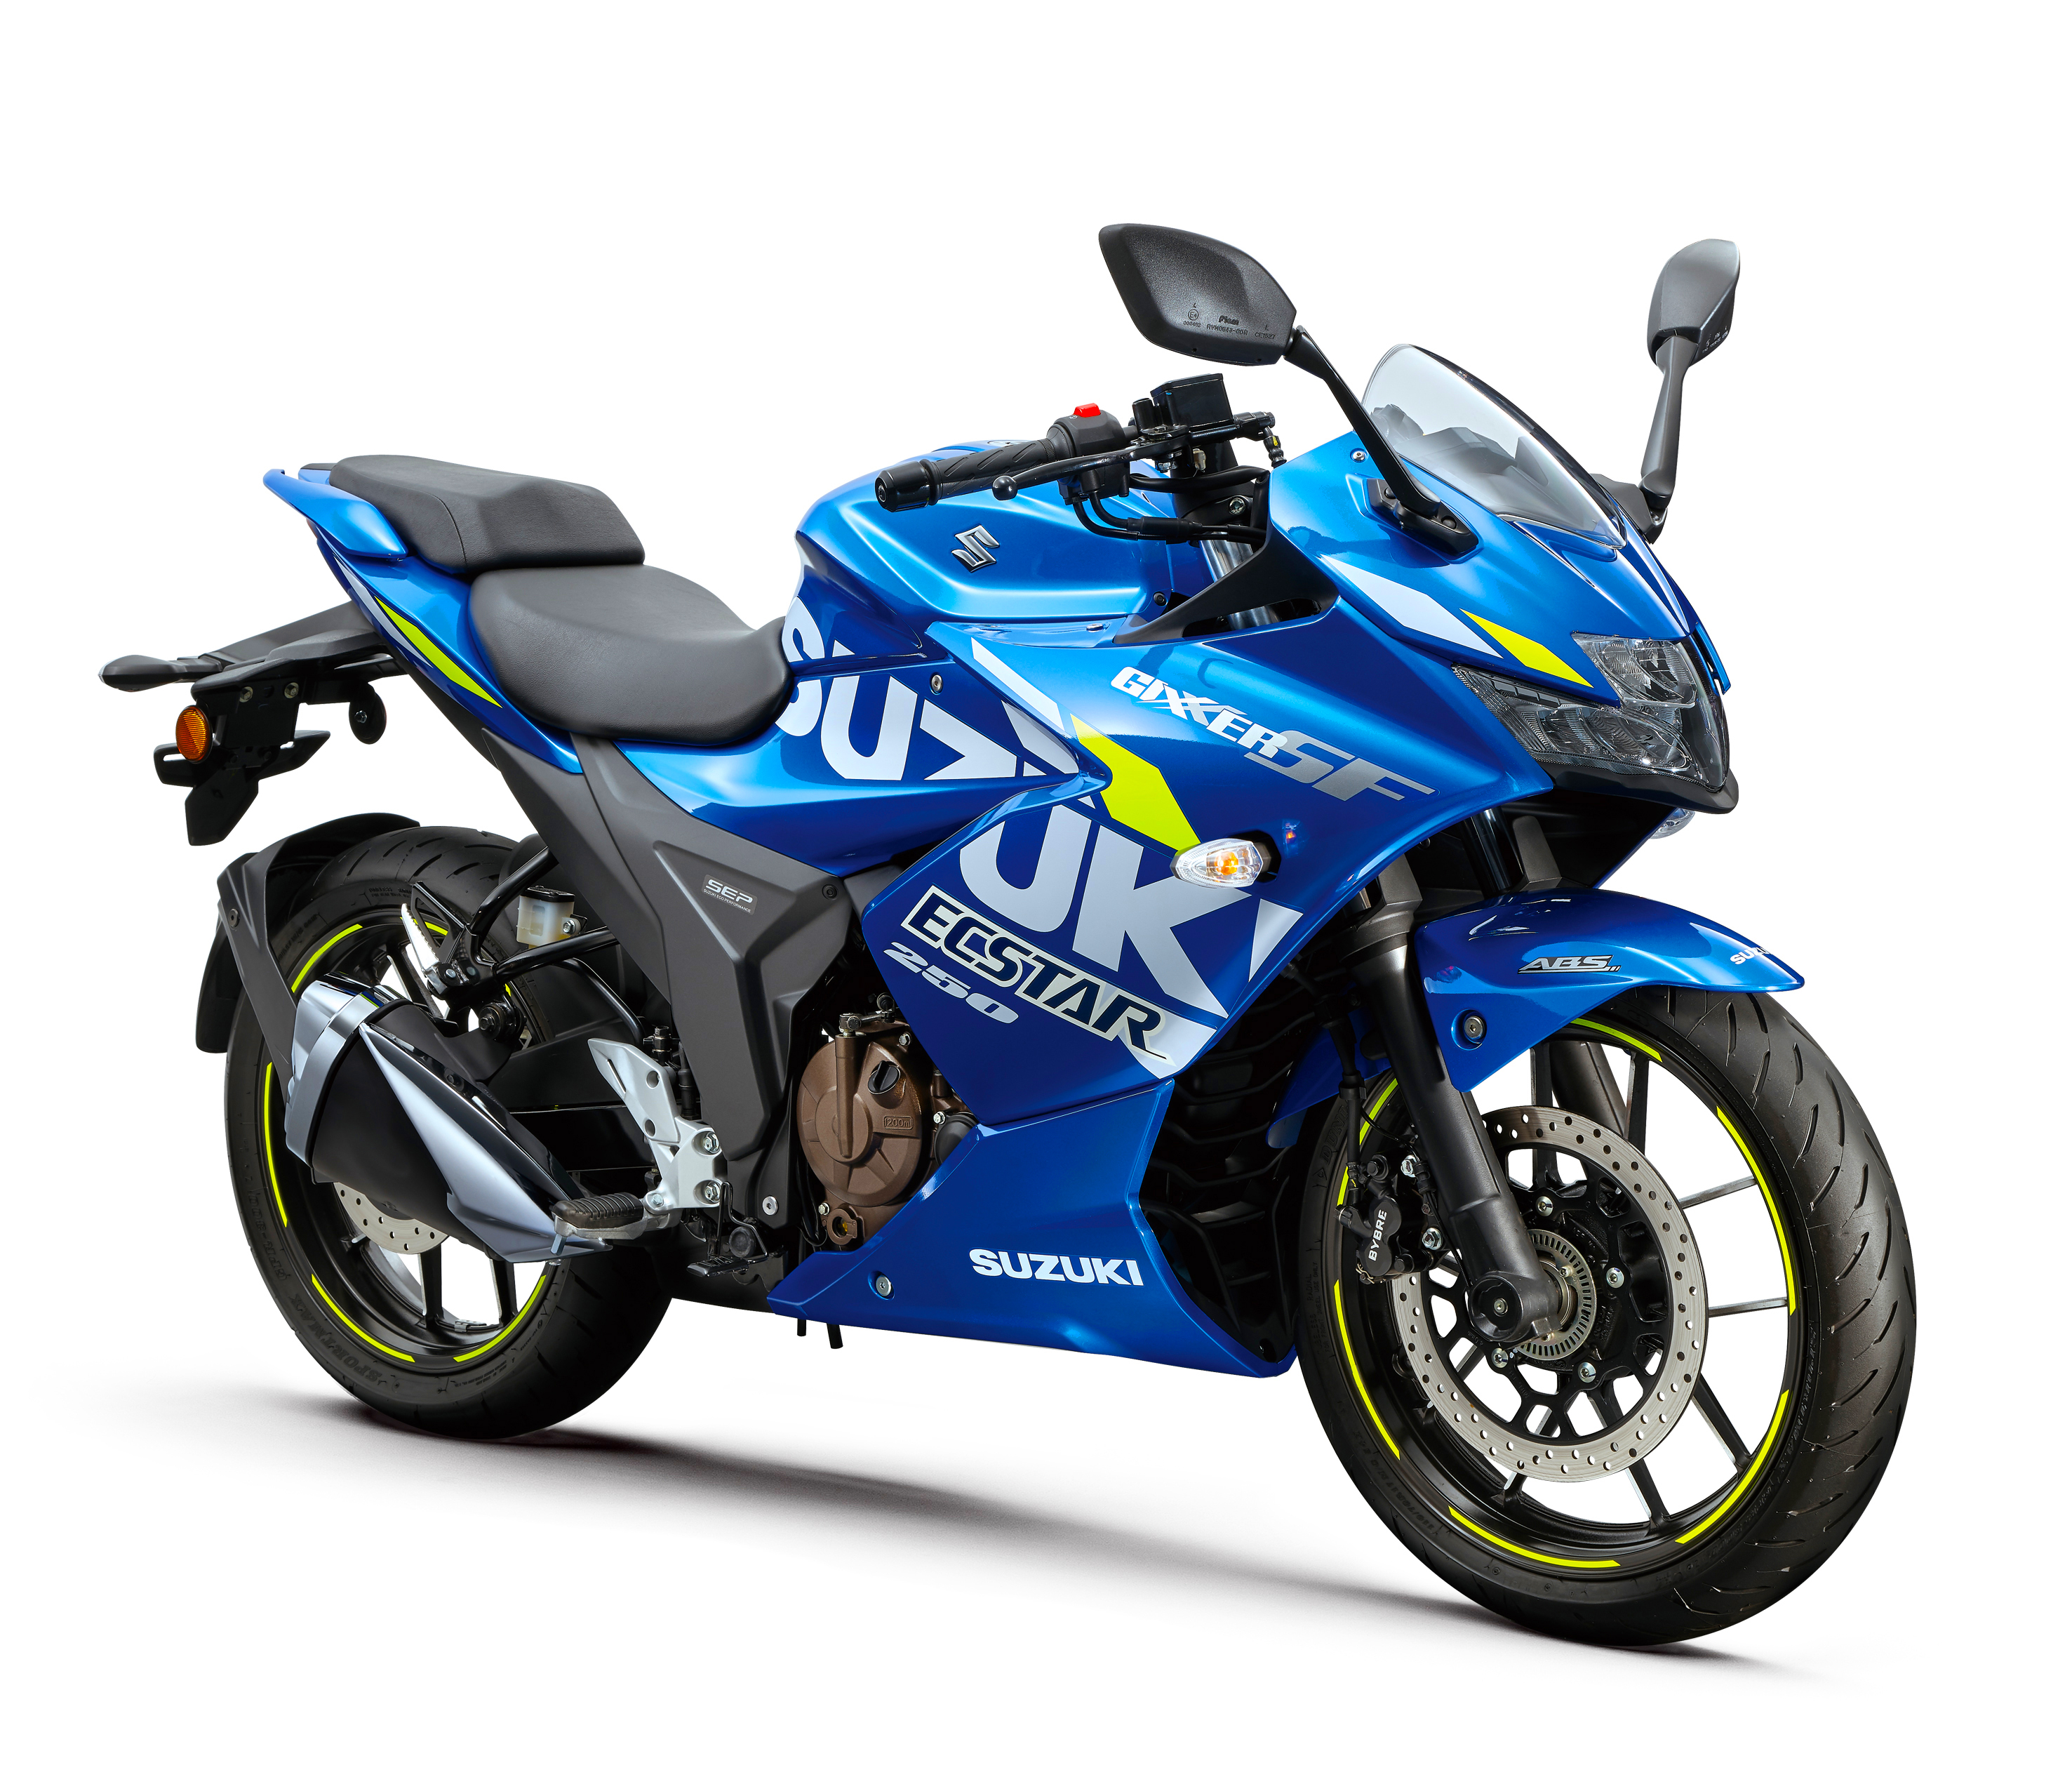 2021 GixxerSF250  MotoGP藍_out_S25cm